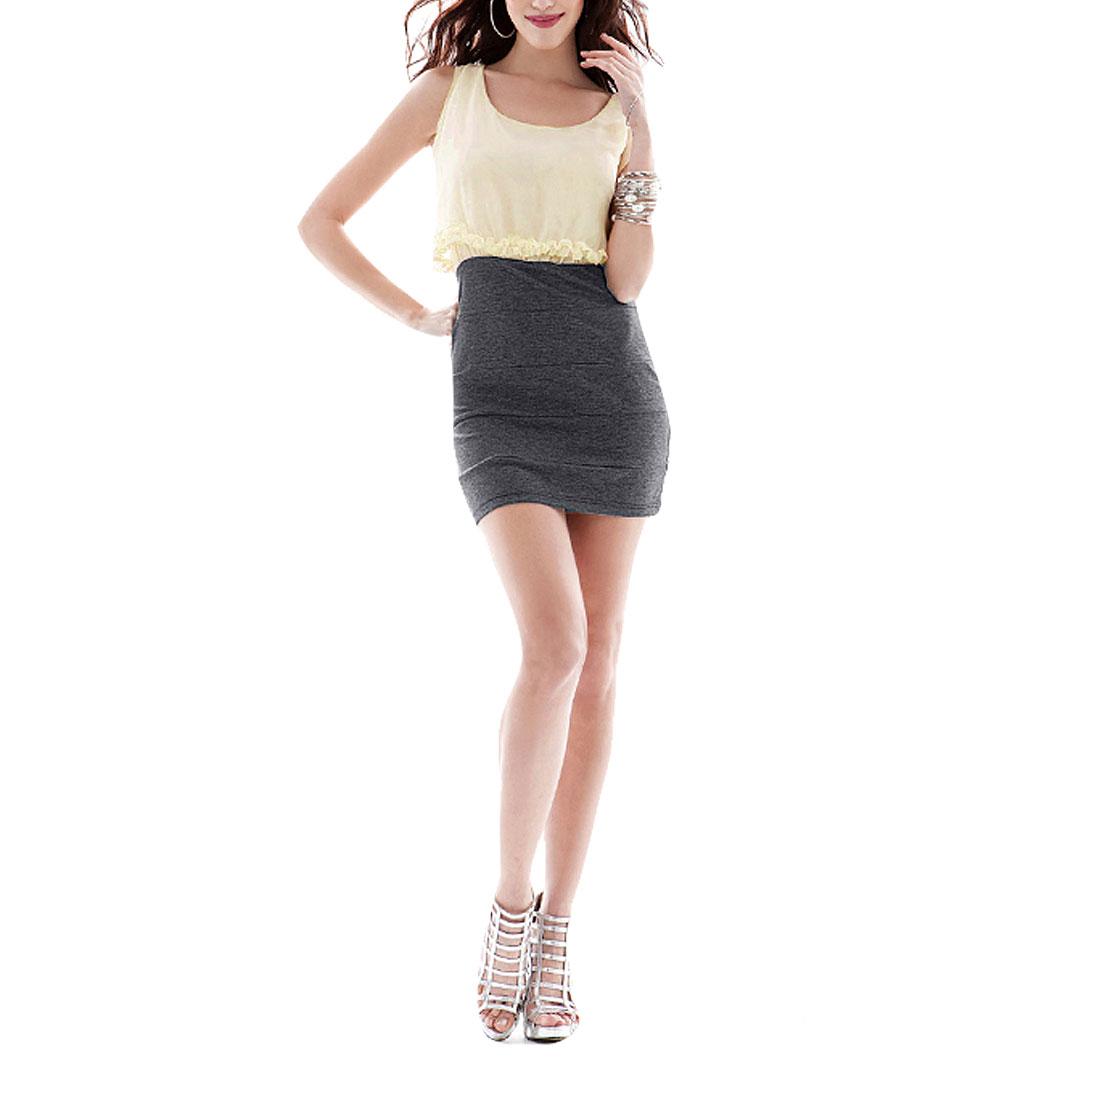 Light Beige Pullover Lining Sleeveless Layered Dresses Mini Dress for Ladies XS